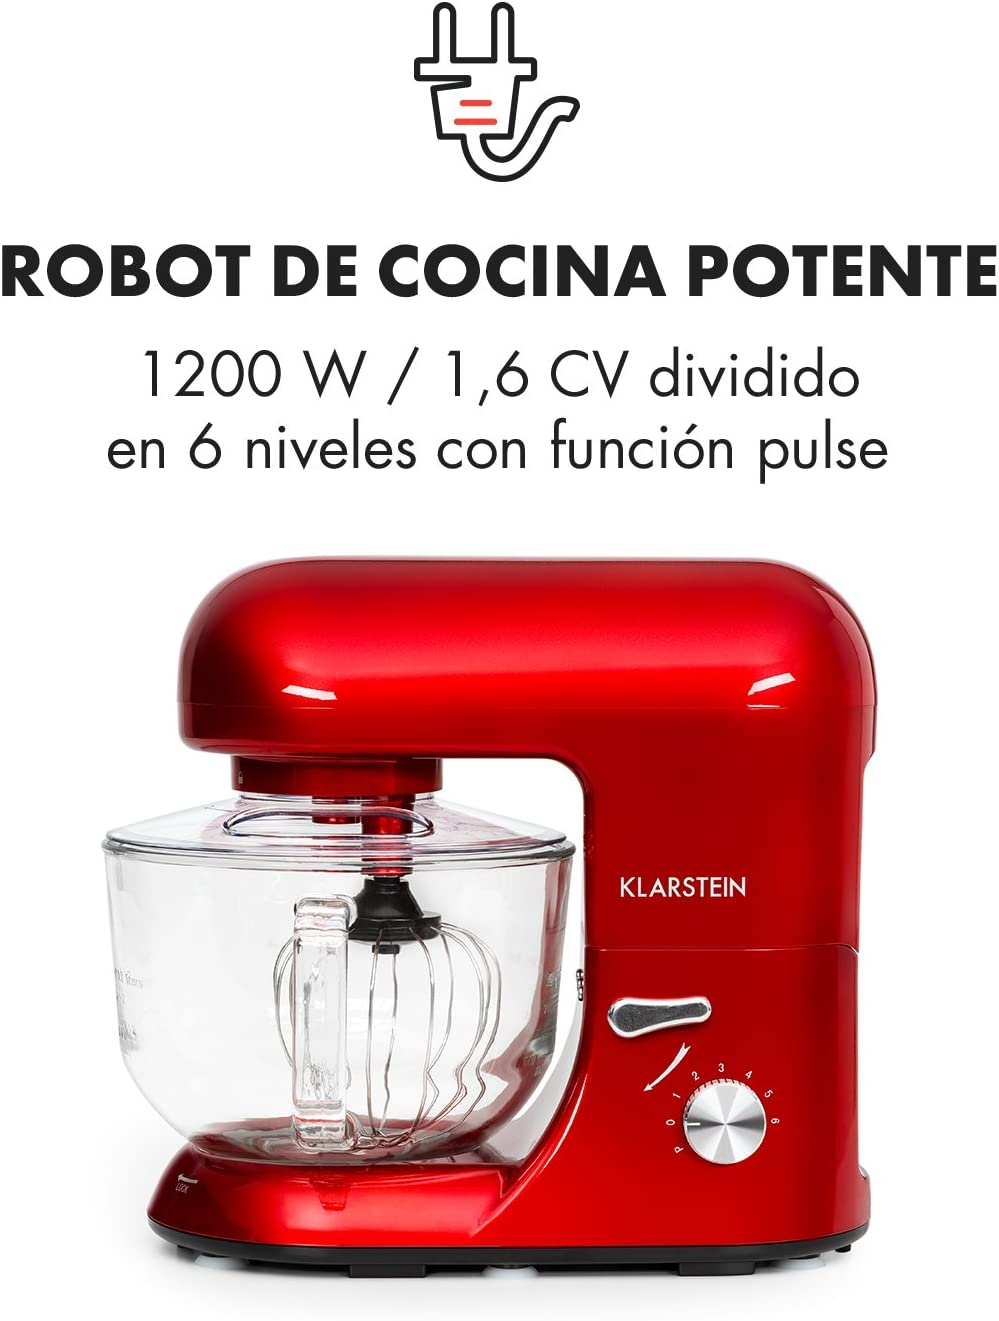 Klarstein - Bella Rossa 2G, Robot de Cocina, Mezcla, Amasadora, Batidora, 1200W, 2,5 a 5,2 L, Bol Cristal, 6 velocidades, Función Pulso, Sistema de Mezcla planetaria, Gancho amasar, Rojo: Amazon.es: Hogar